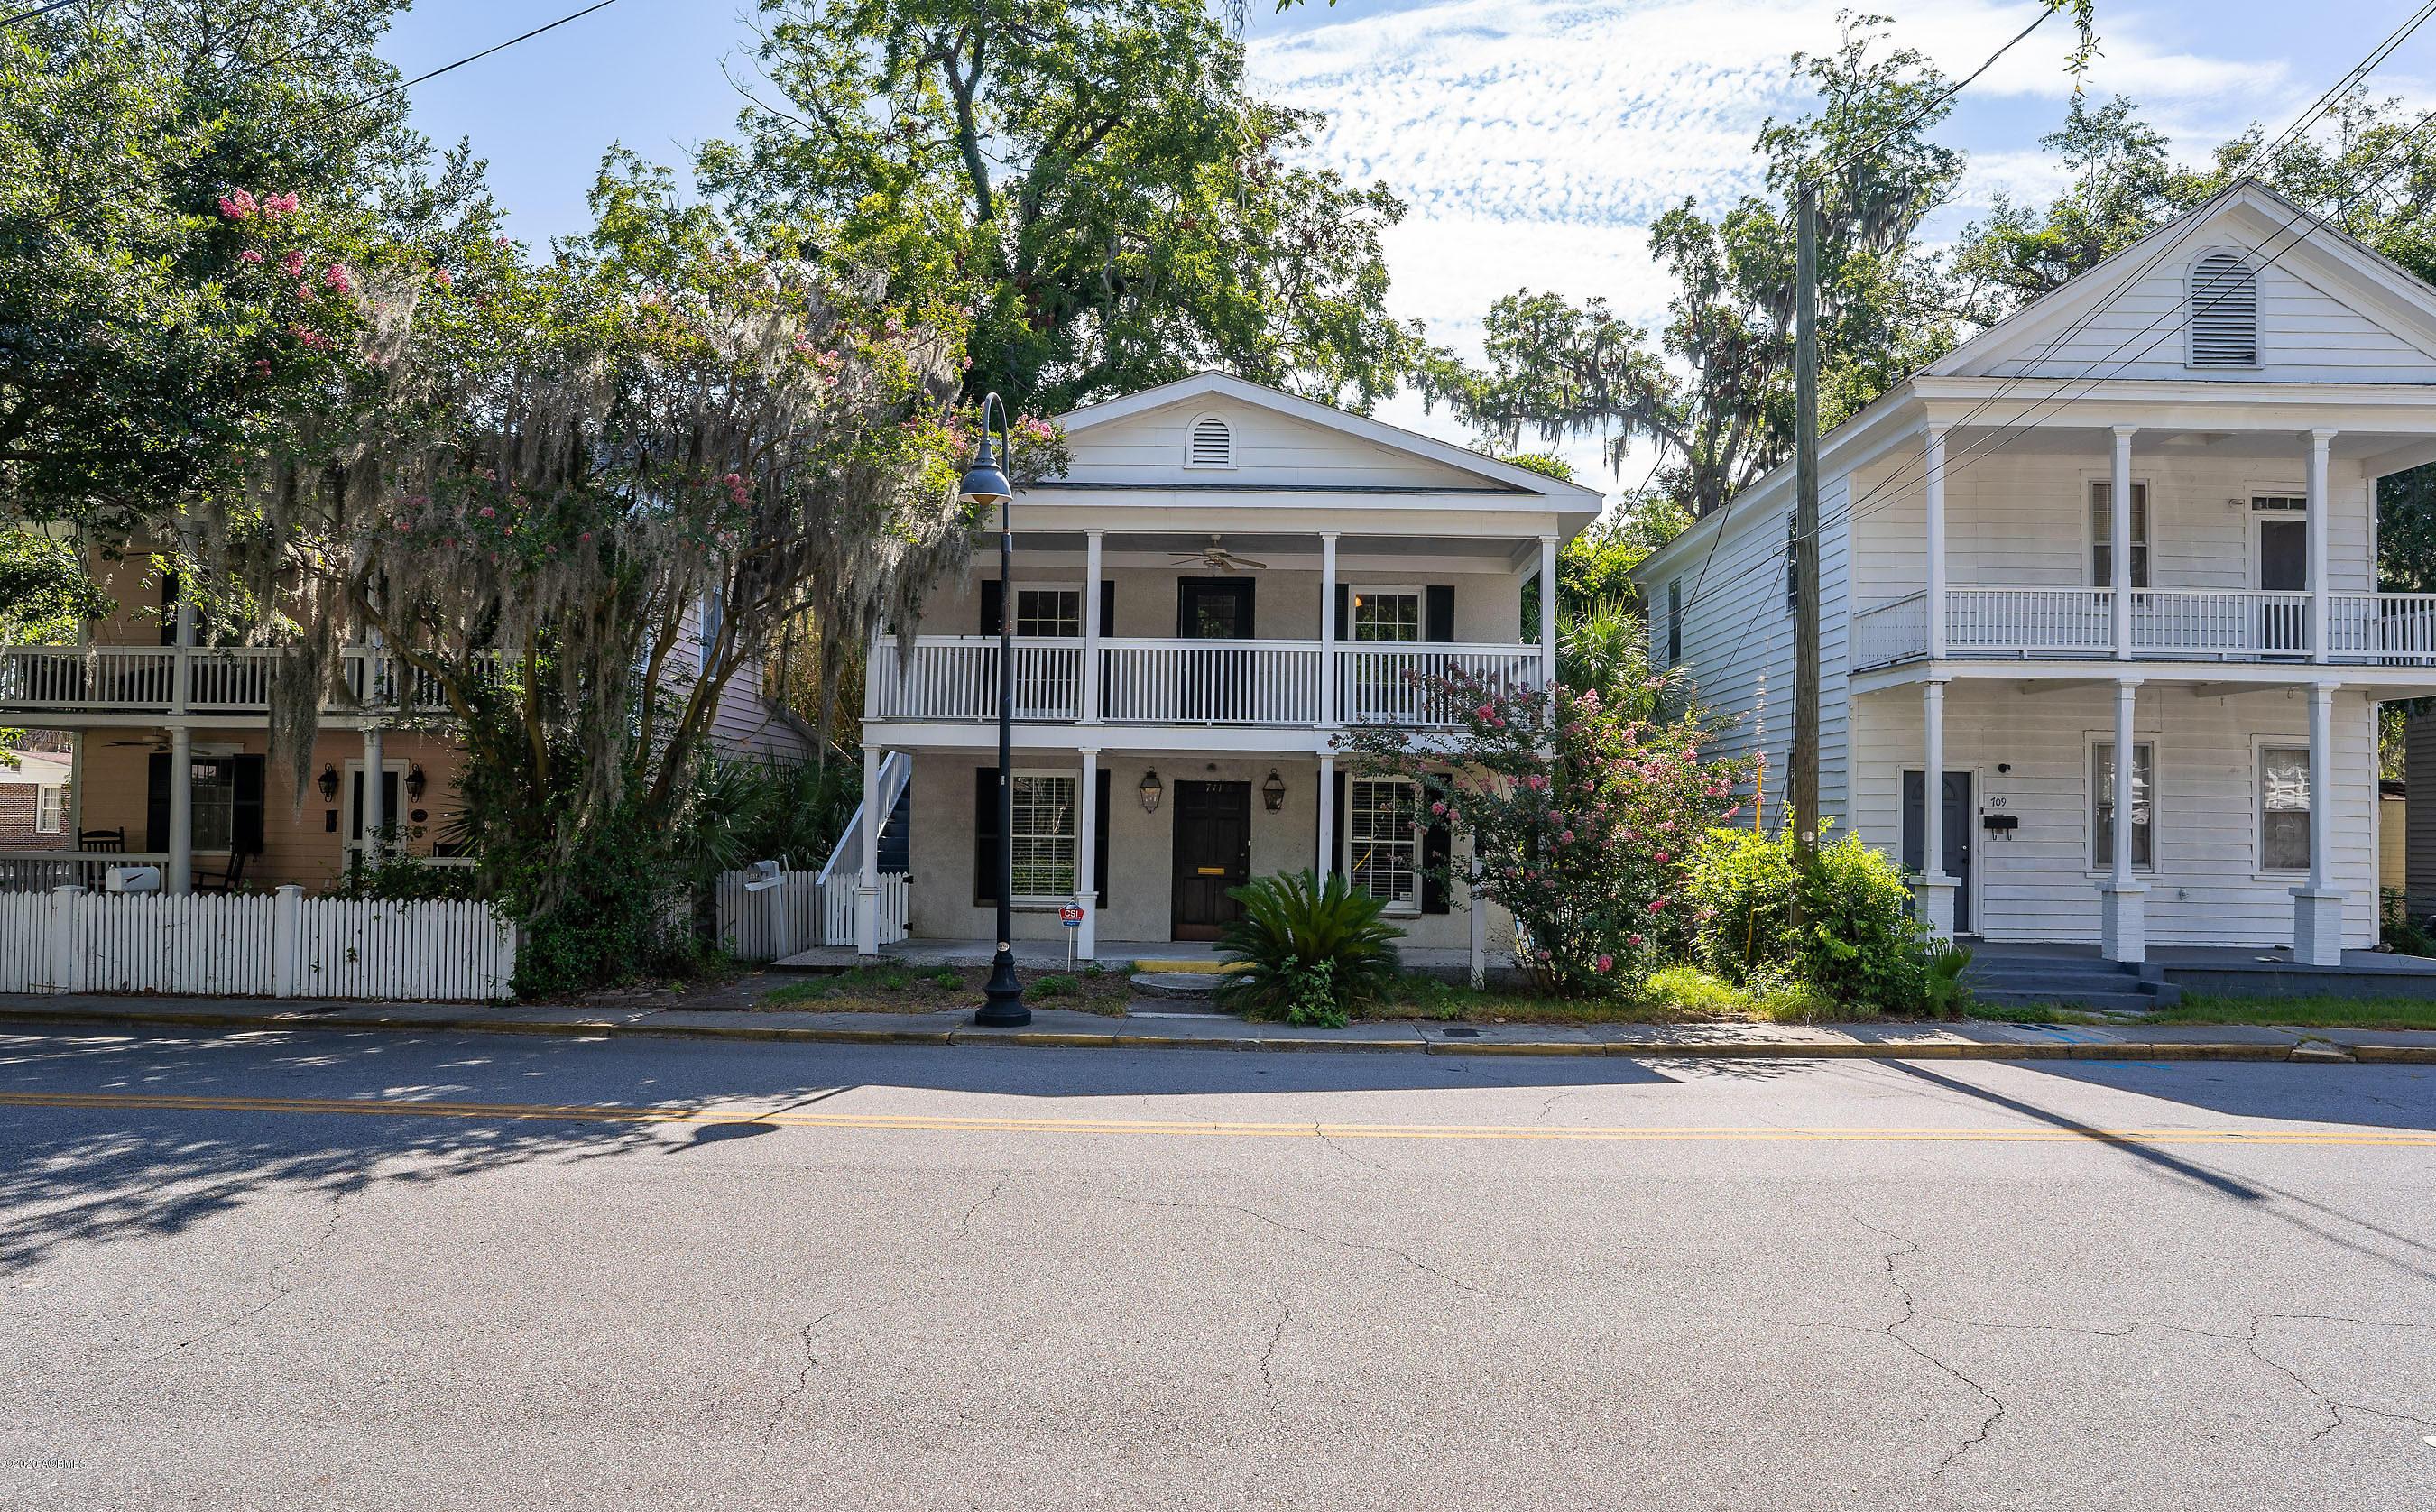 Photo of 711 Charles Street, Beaufort, SC 29902